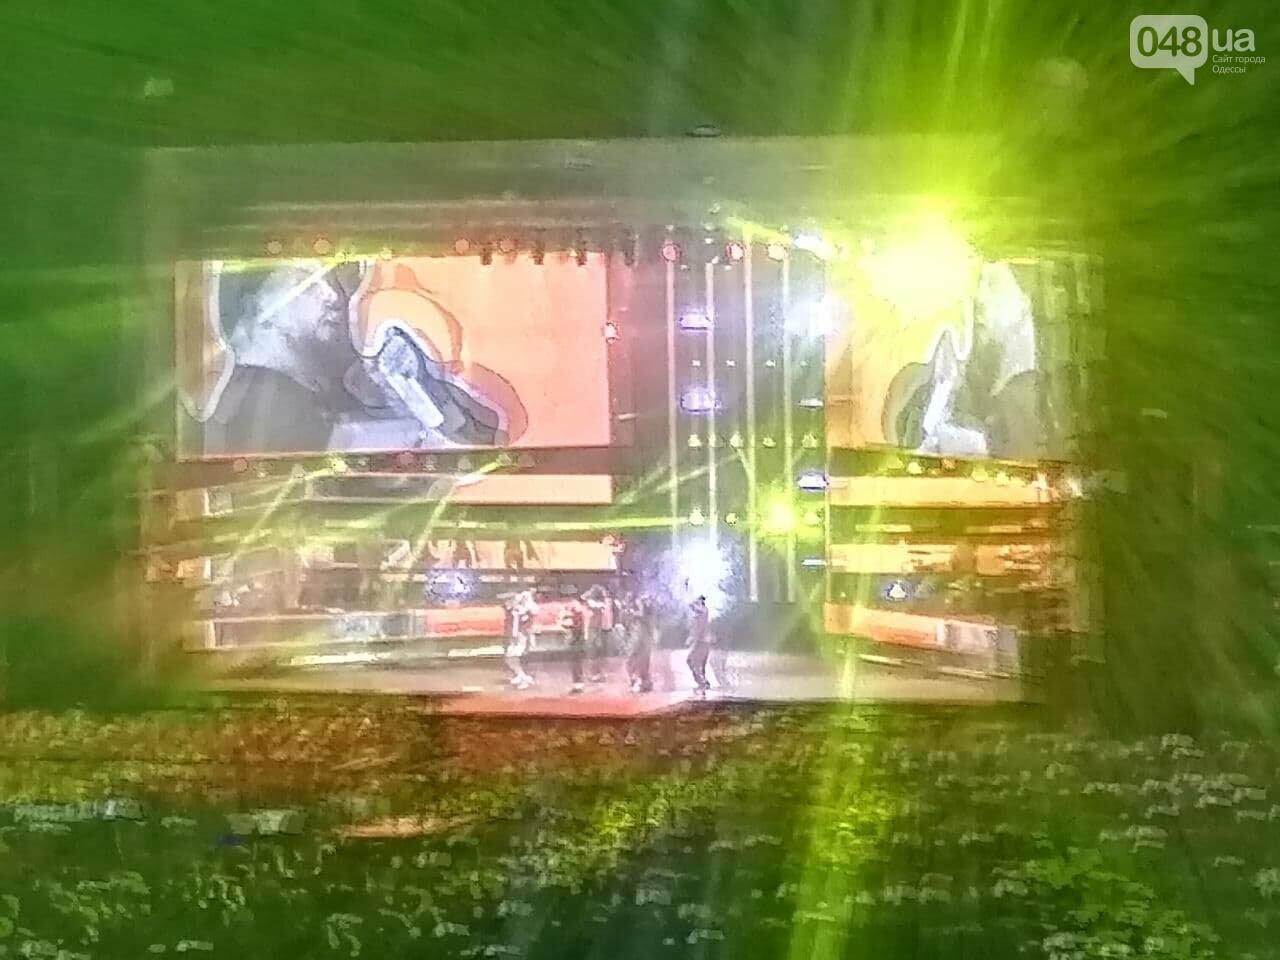 Монатик на стадионе спел все песни об Одессе, - ФОТО, ВИДЕО, фото-10